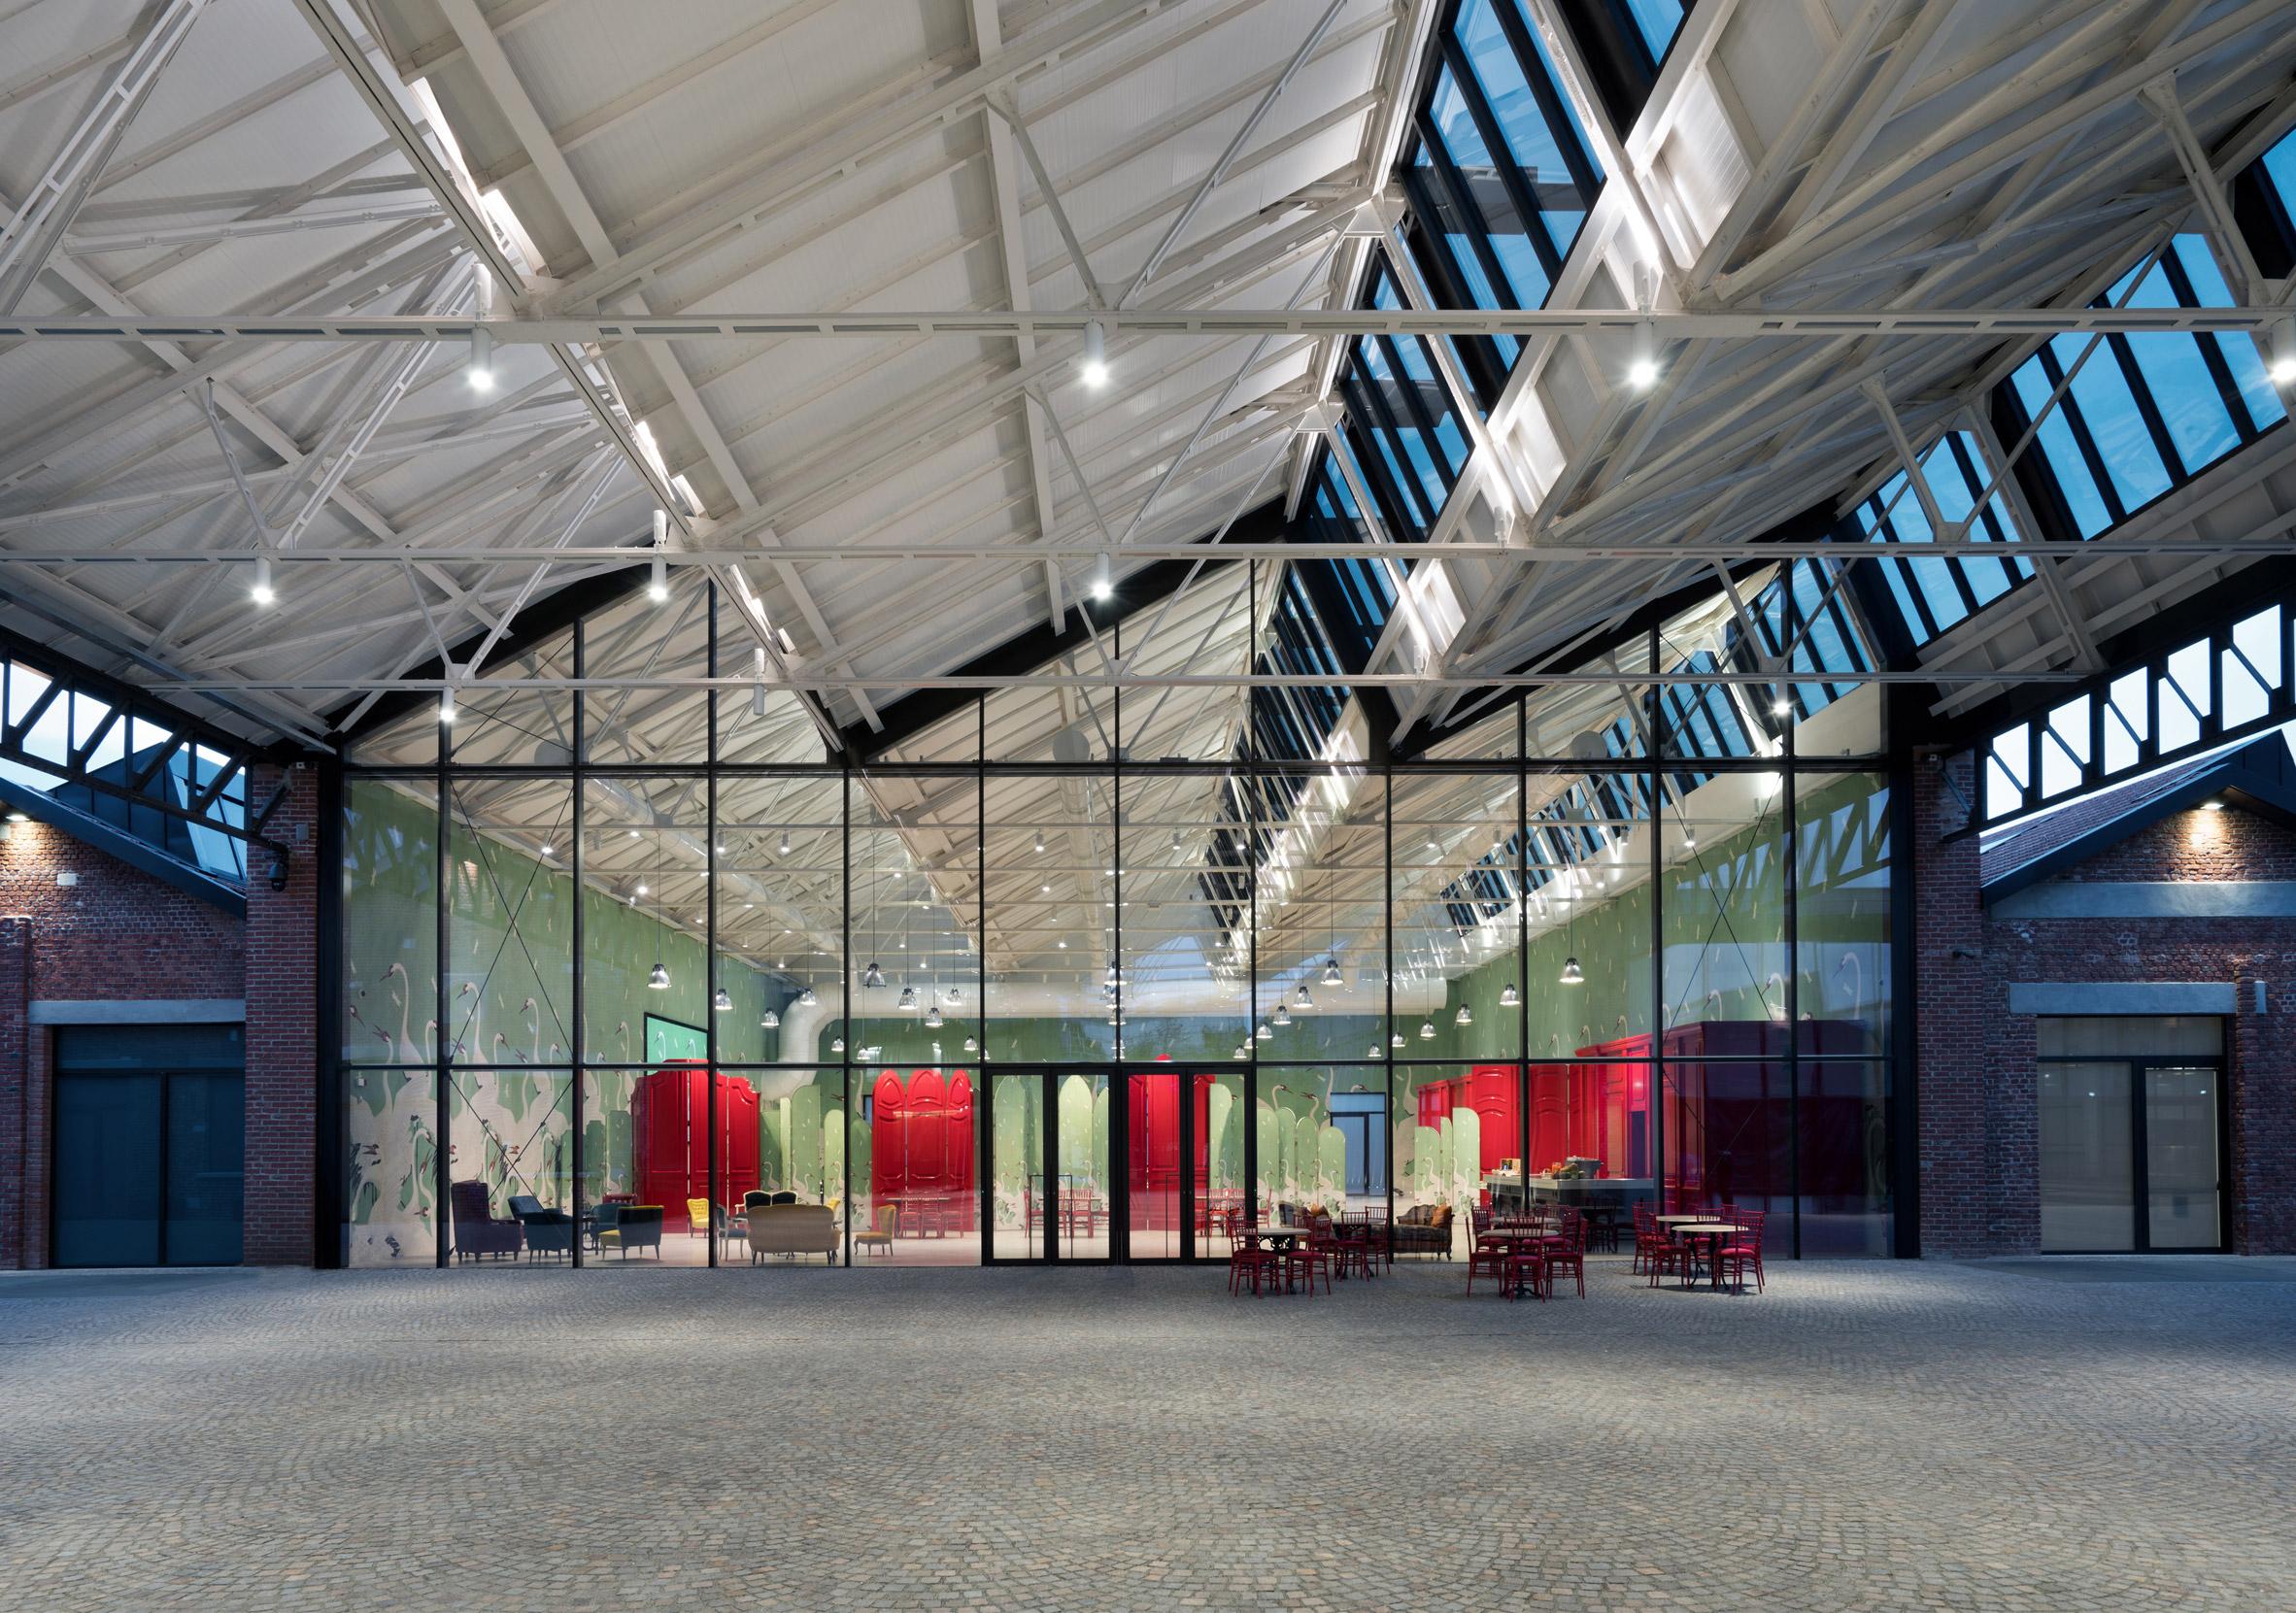 Gucci Headquarters by Piuarch